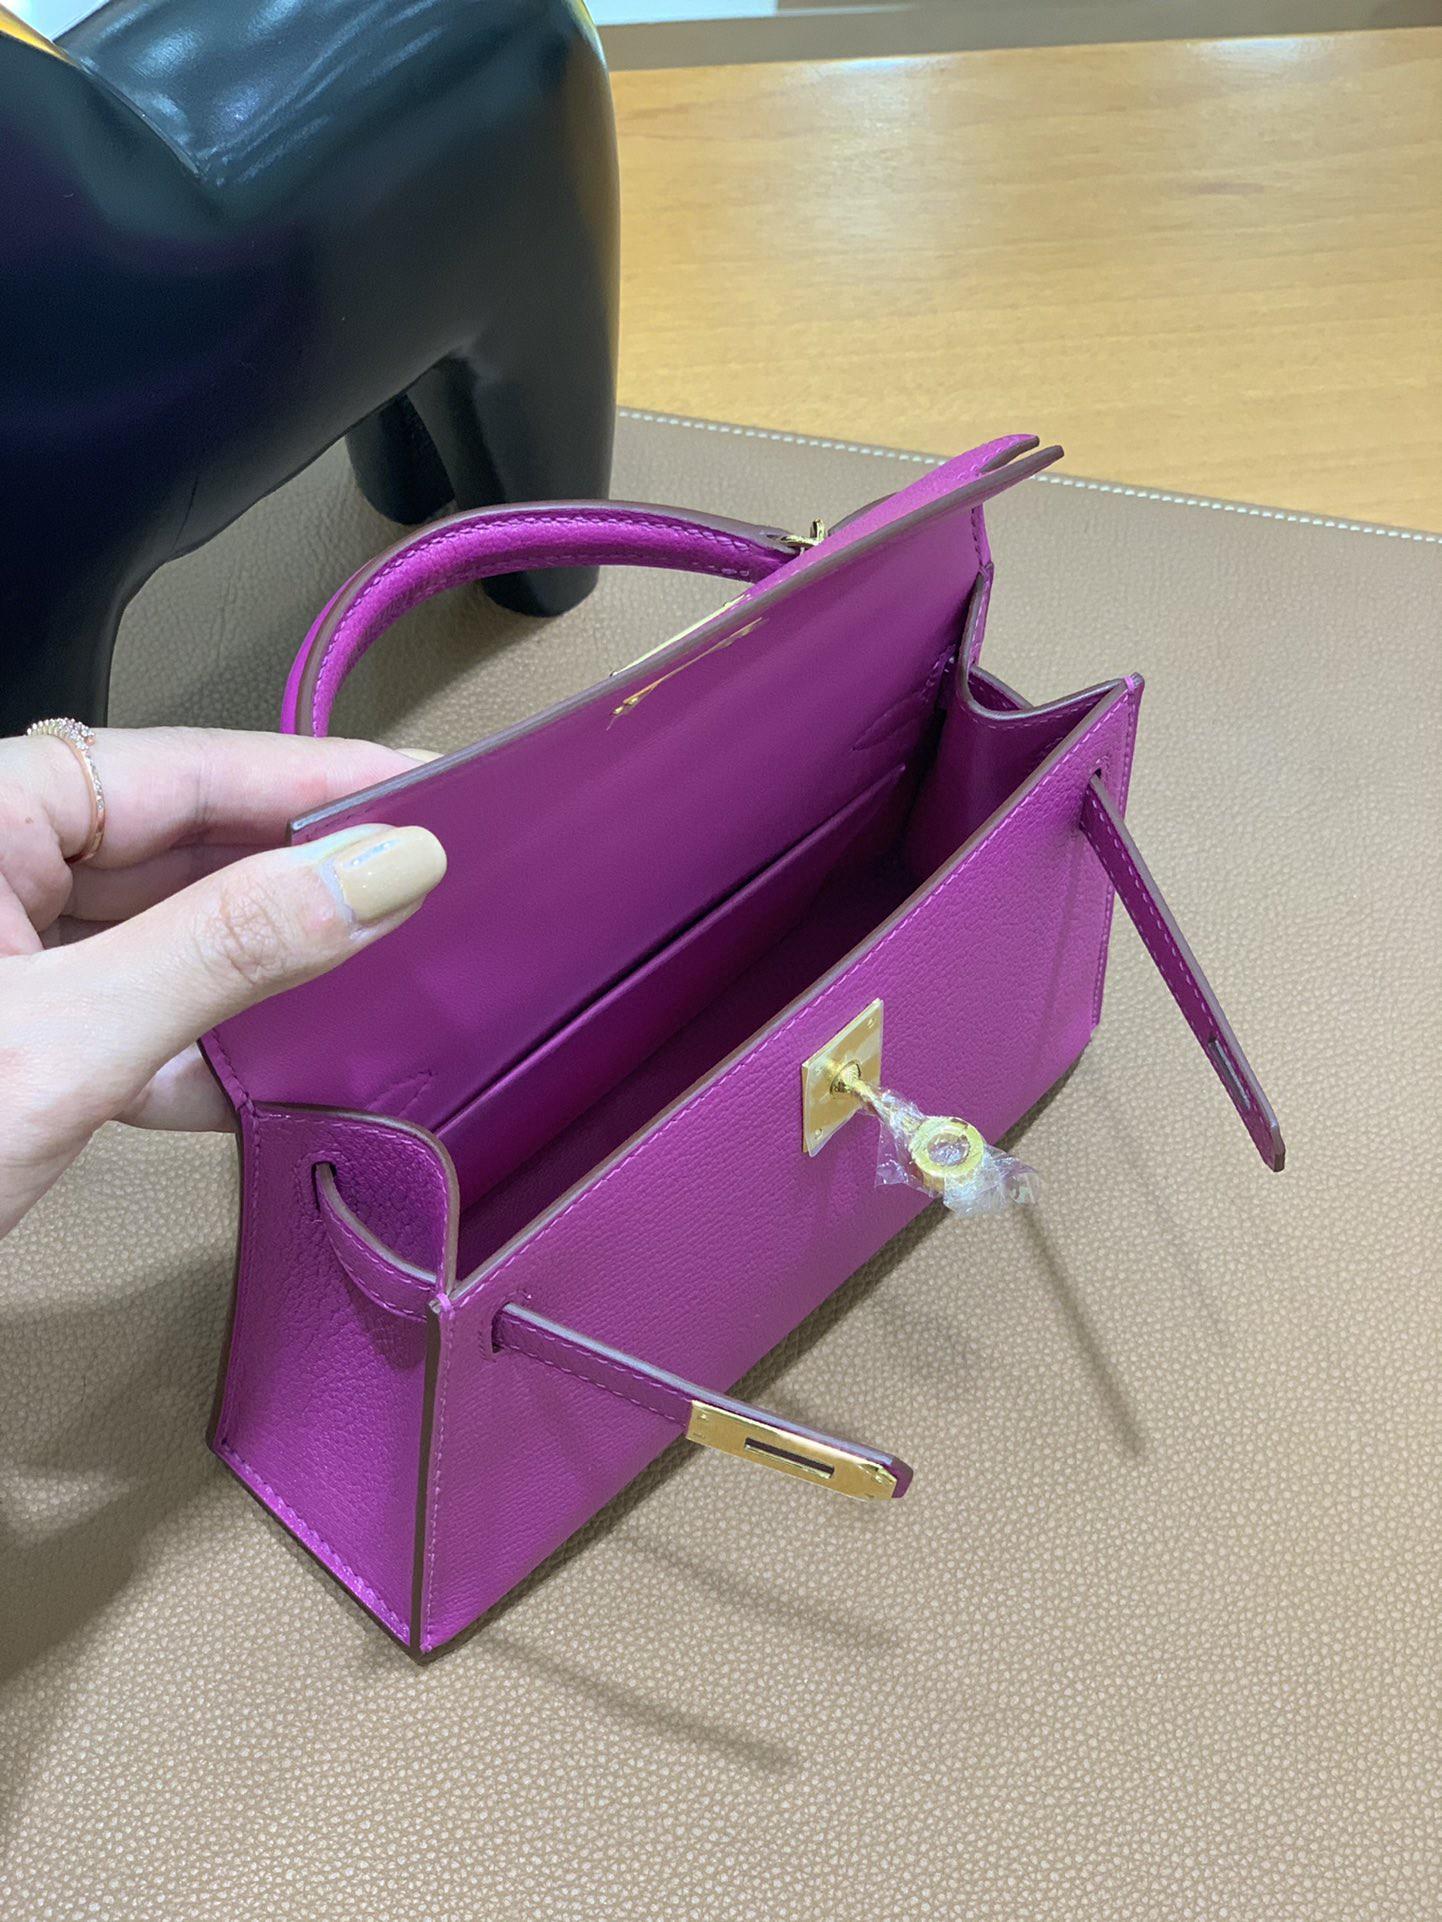 Hermès(爱马仕)minikelly 迷你凯莉 山羊皮 玫瑰紫 19cm 金扣